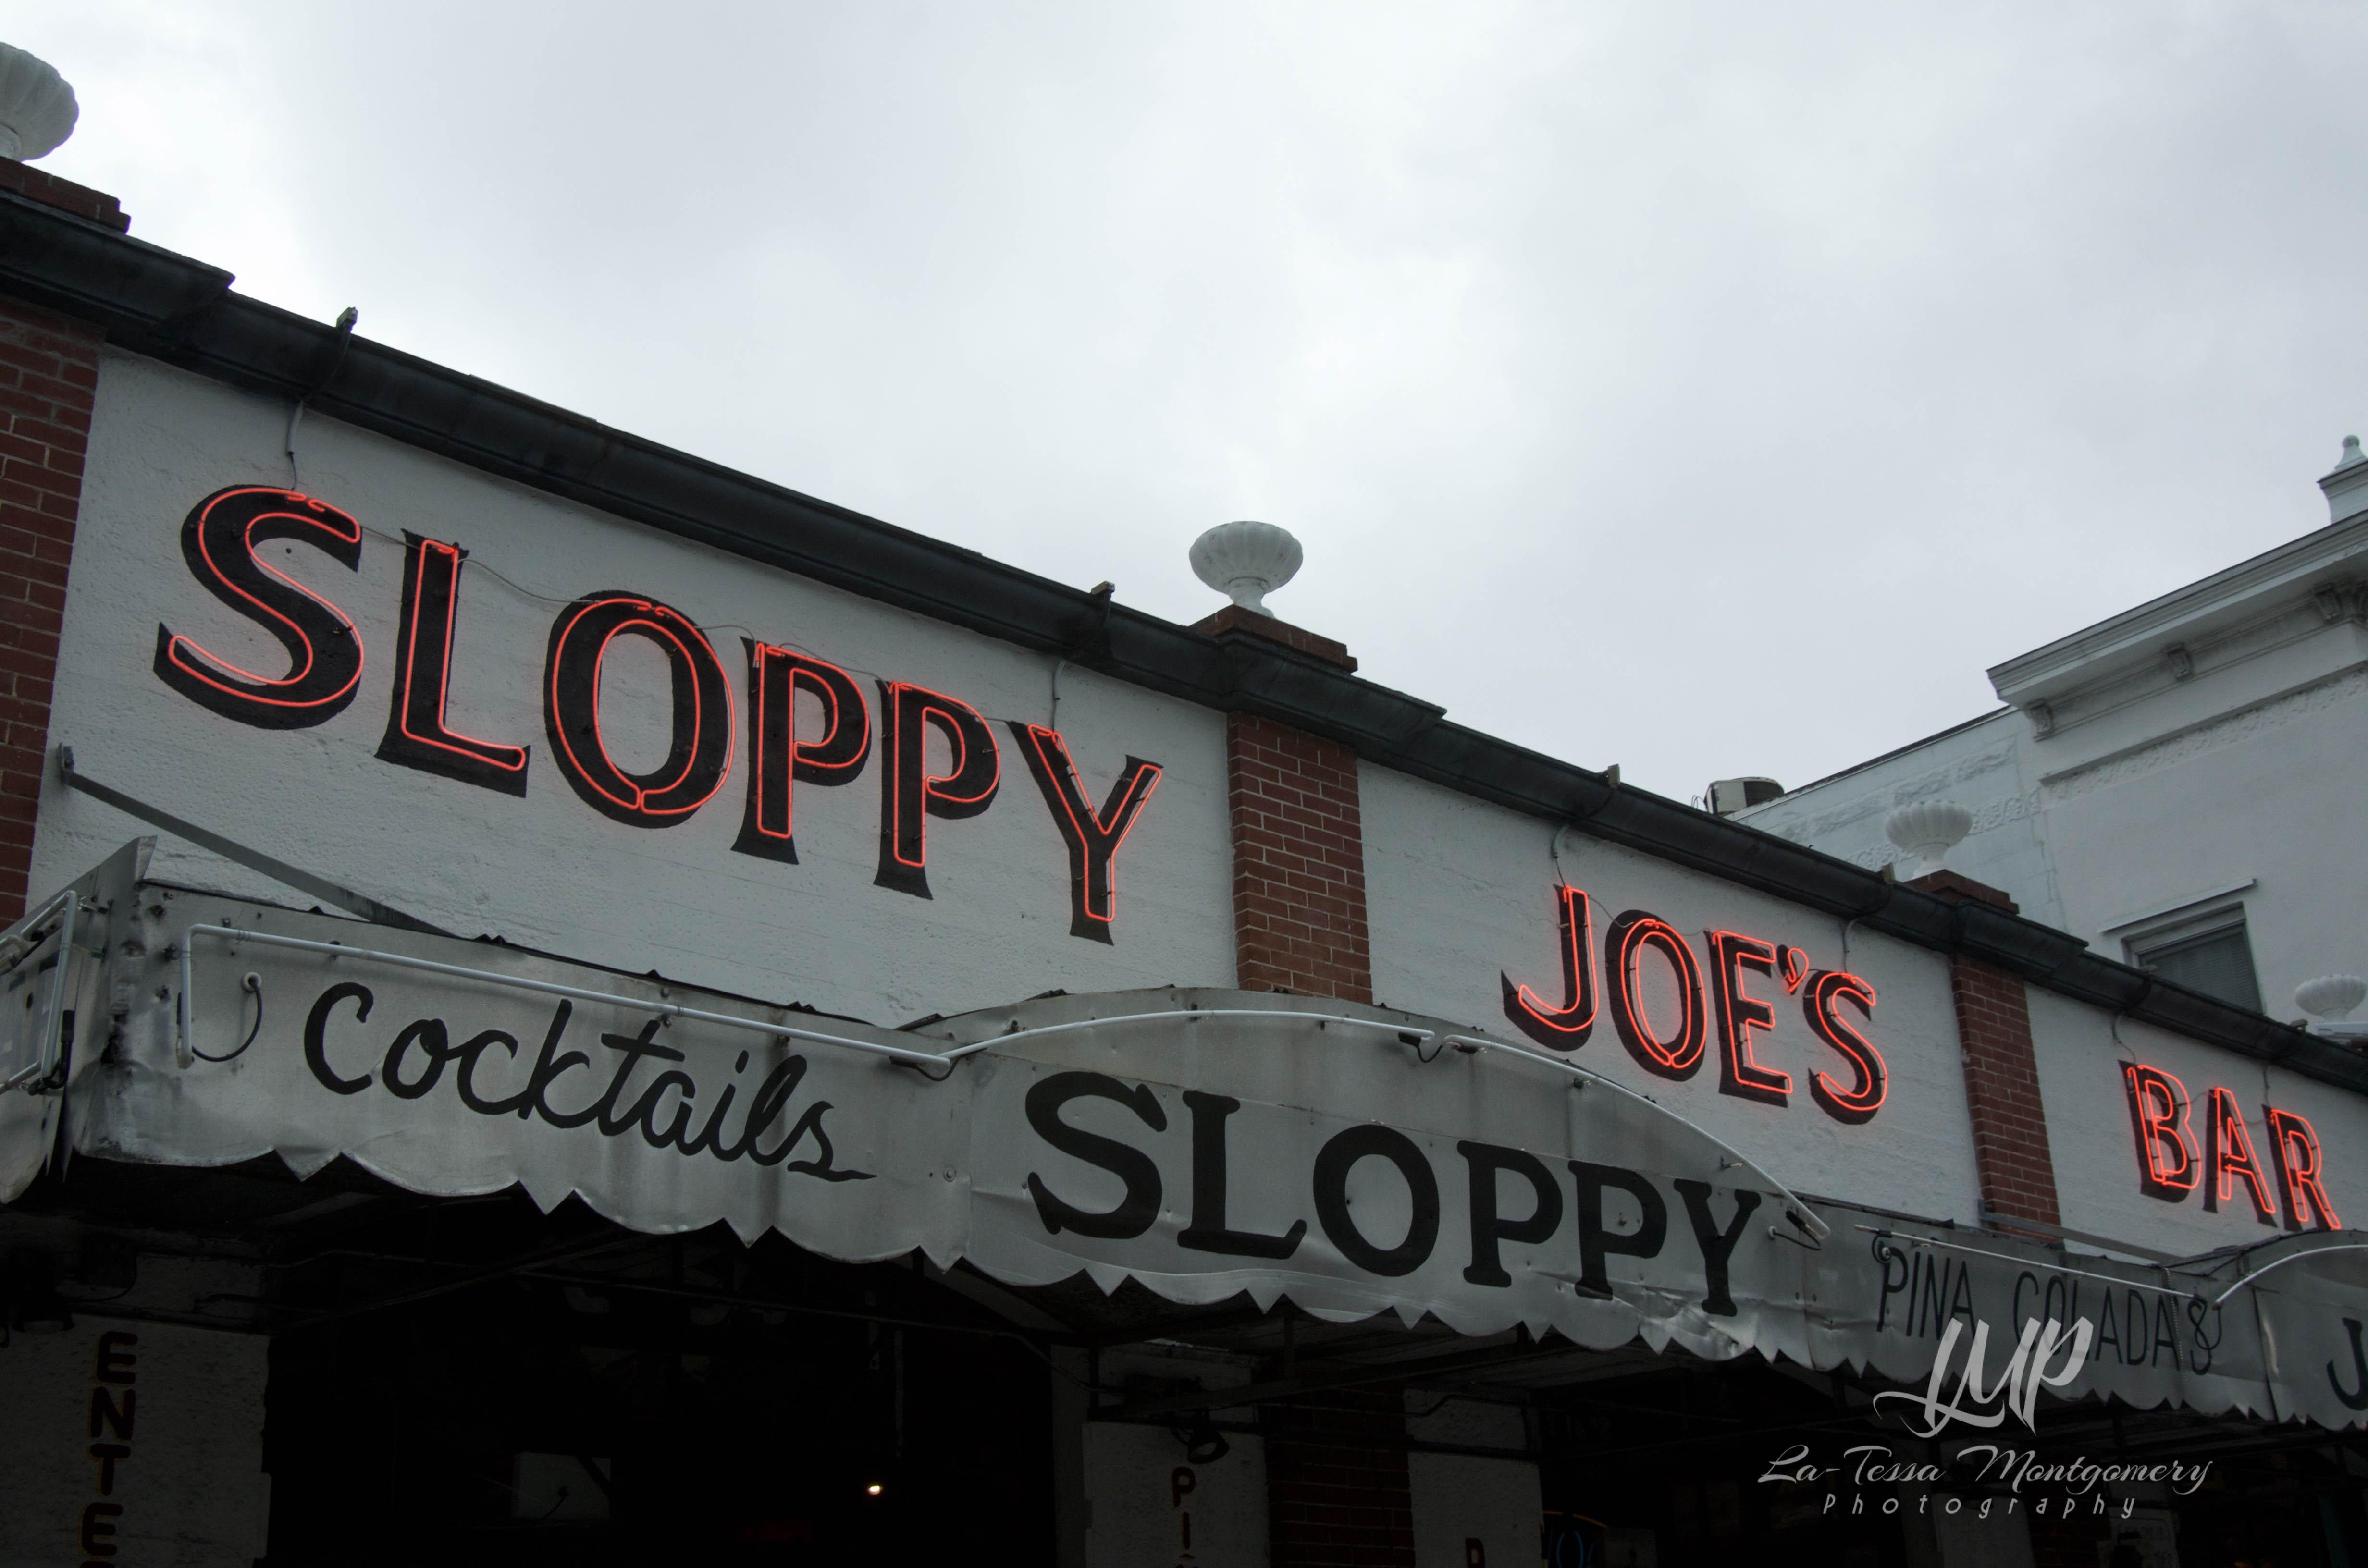 Key West, Sloppy Joe's Bar